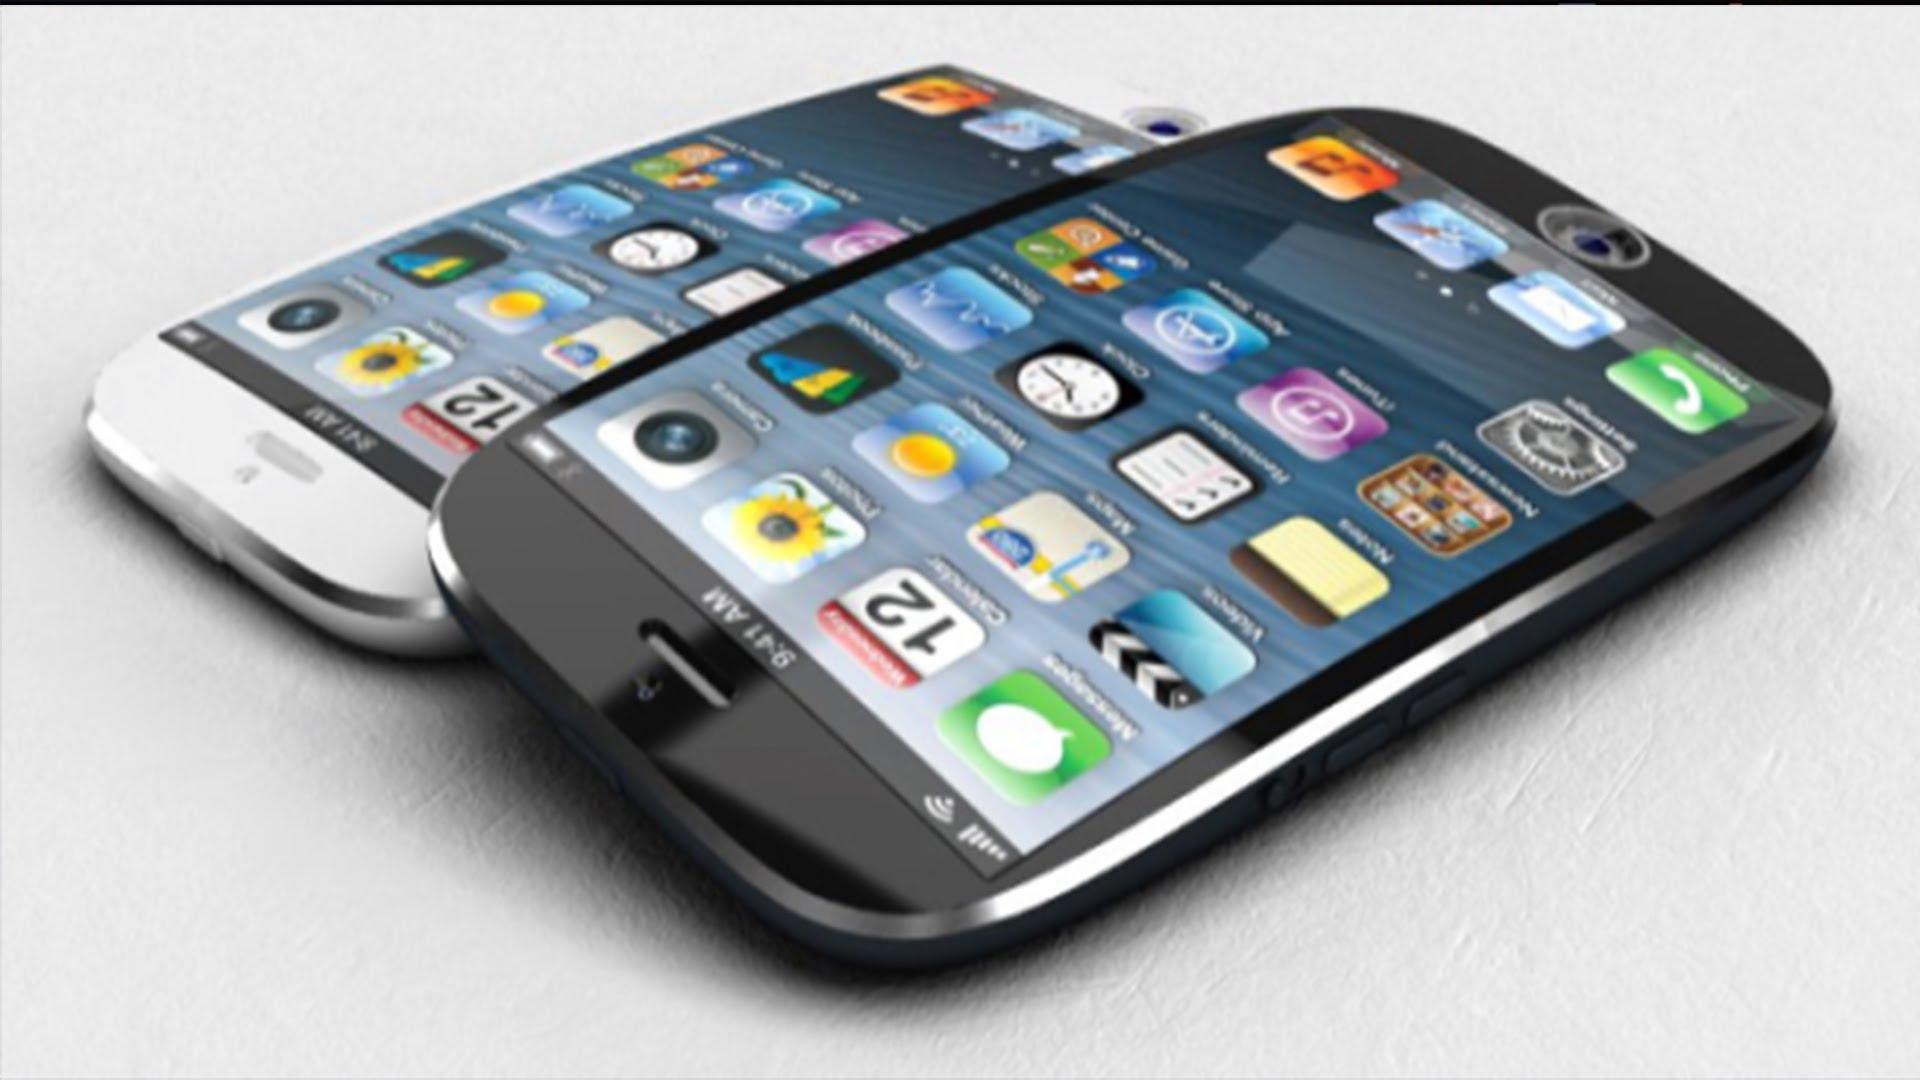 Rumores, rumores y más rumores. ¿ iPhone 7 en 2015 ?